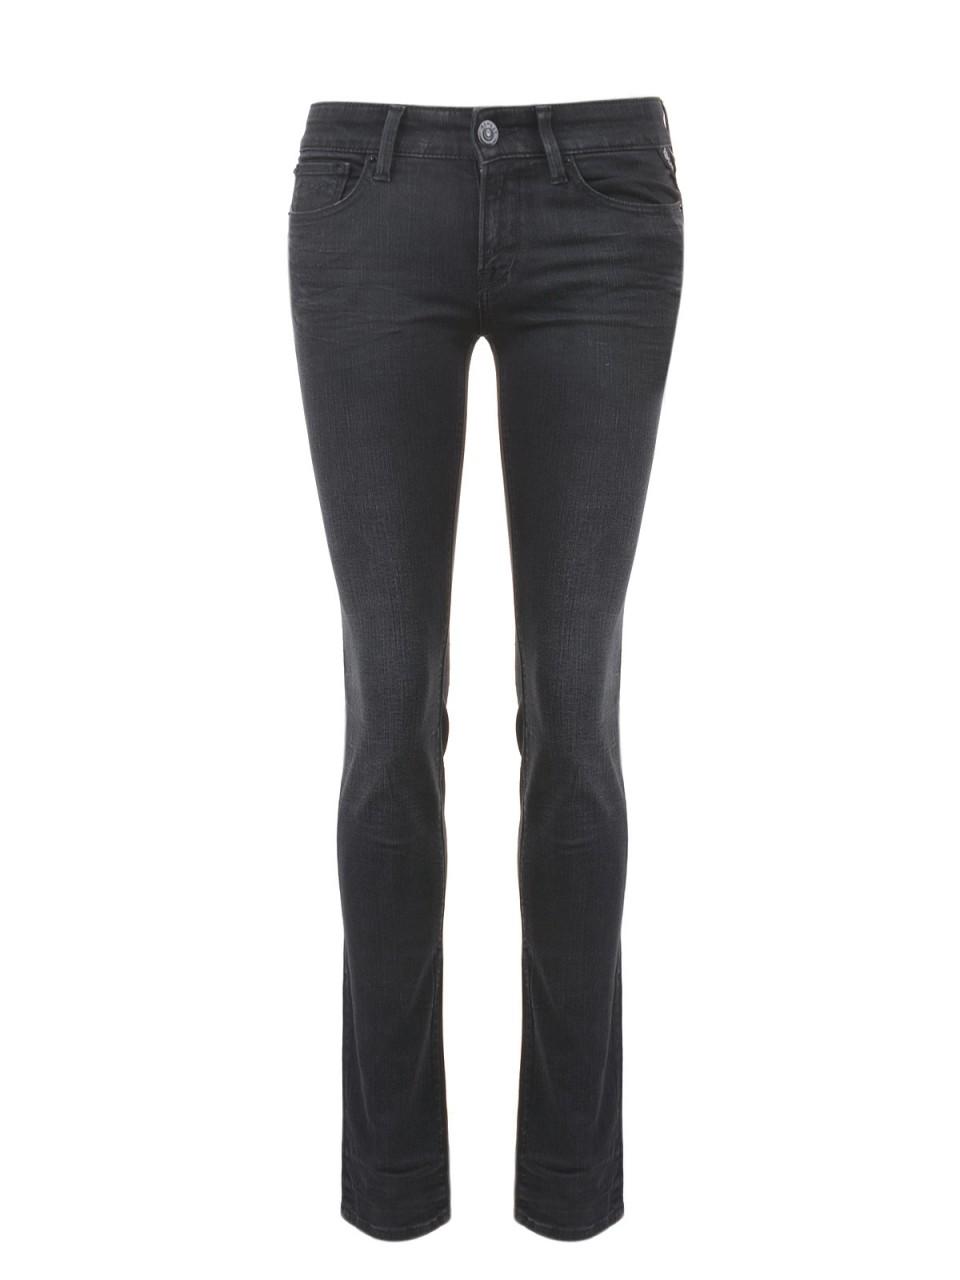 replay-damen-jeans-schwarz